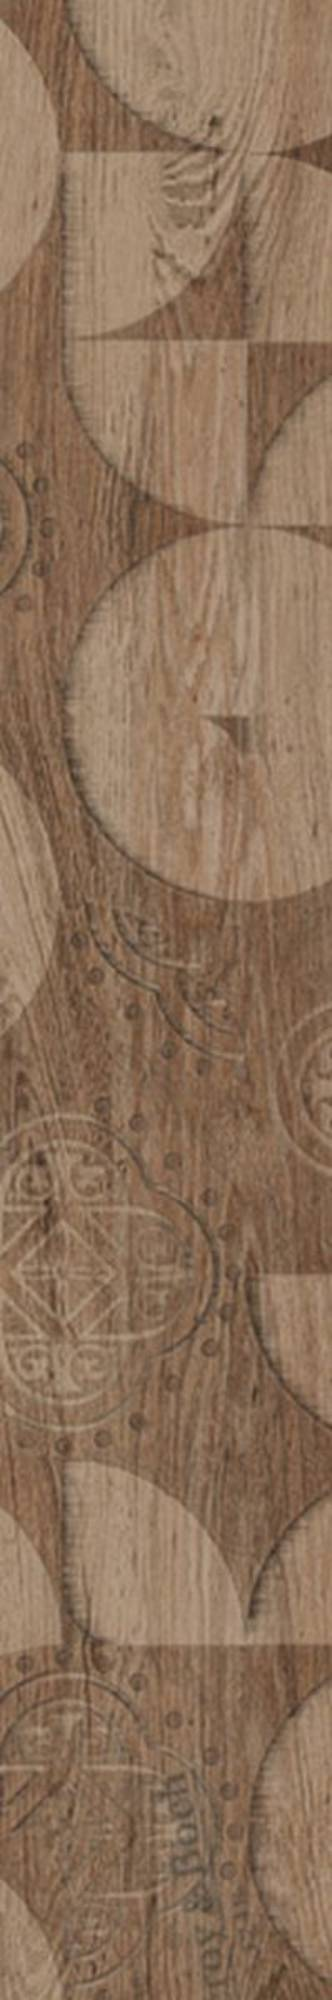 Villeroy & boch Lodge decorstrook 20 x 120 cm. doos a 4 stuks, greige